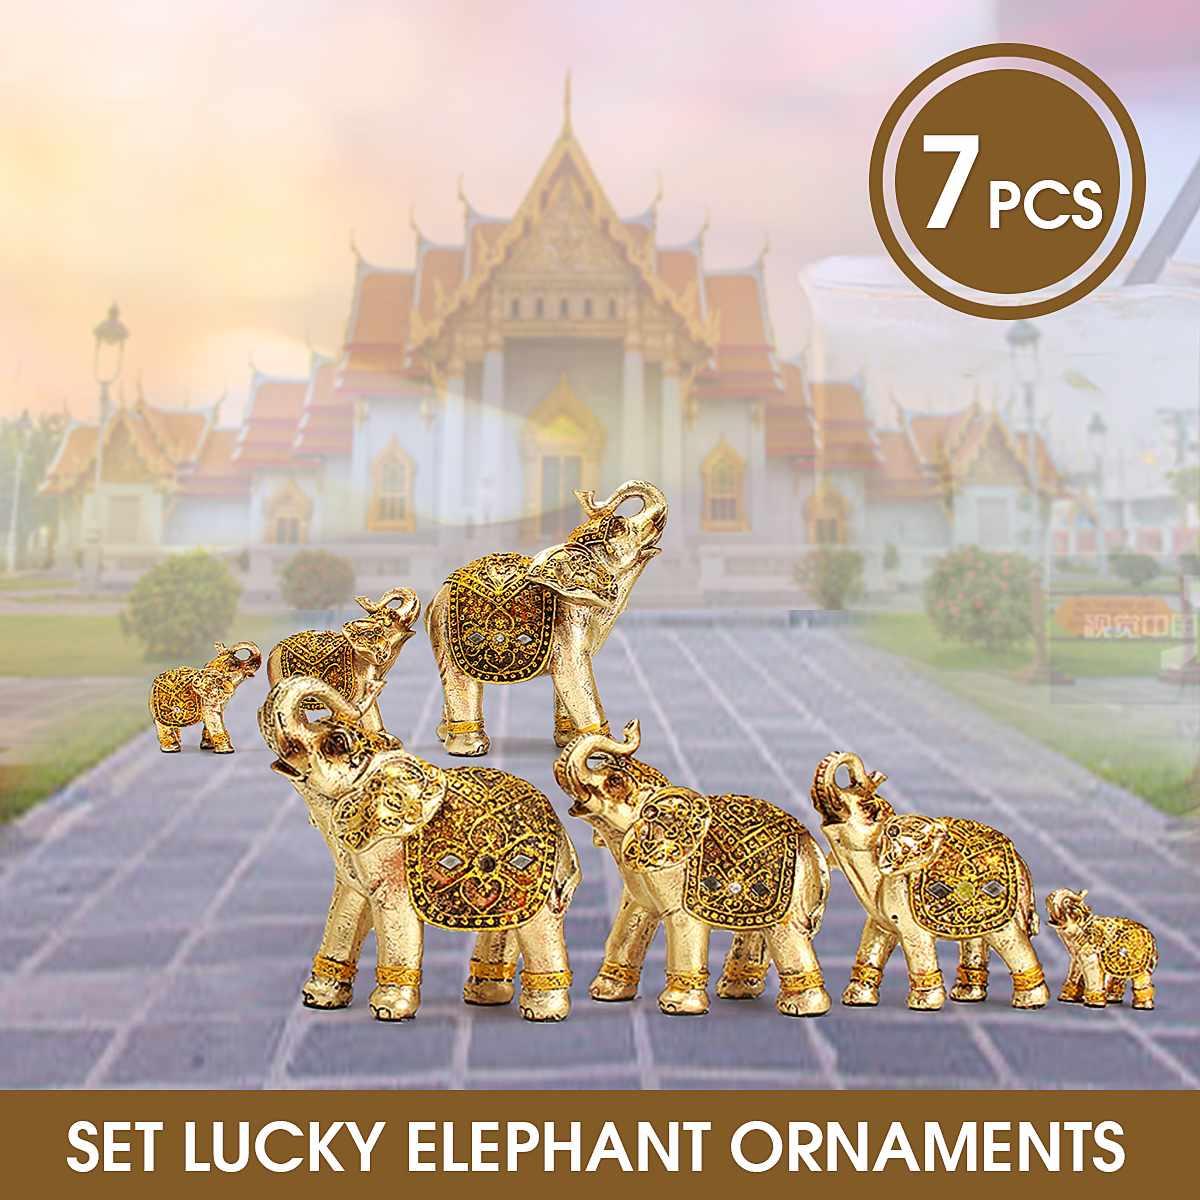 Mini Set Feng Shui Elegant Elephant Trunk Statue Lucky Wealth Figurine Crafts Ornaments Gift for Home Office Desktop Decoration